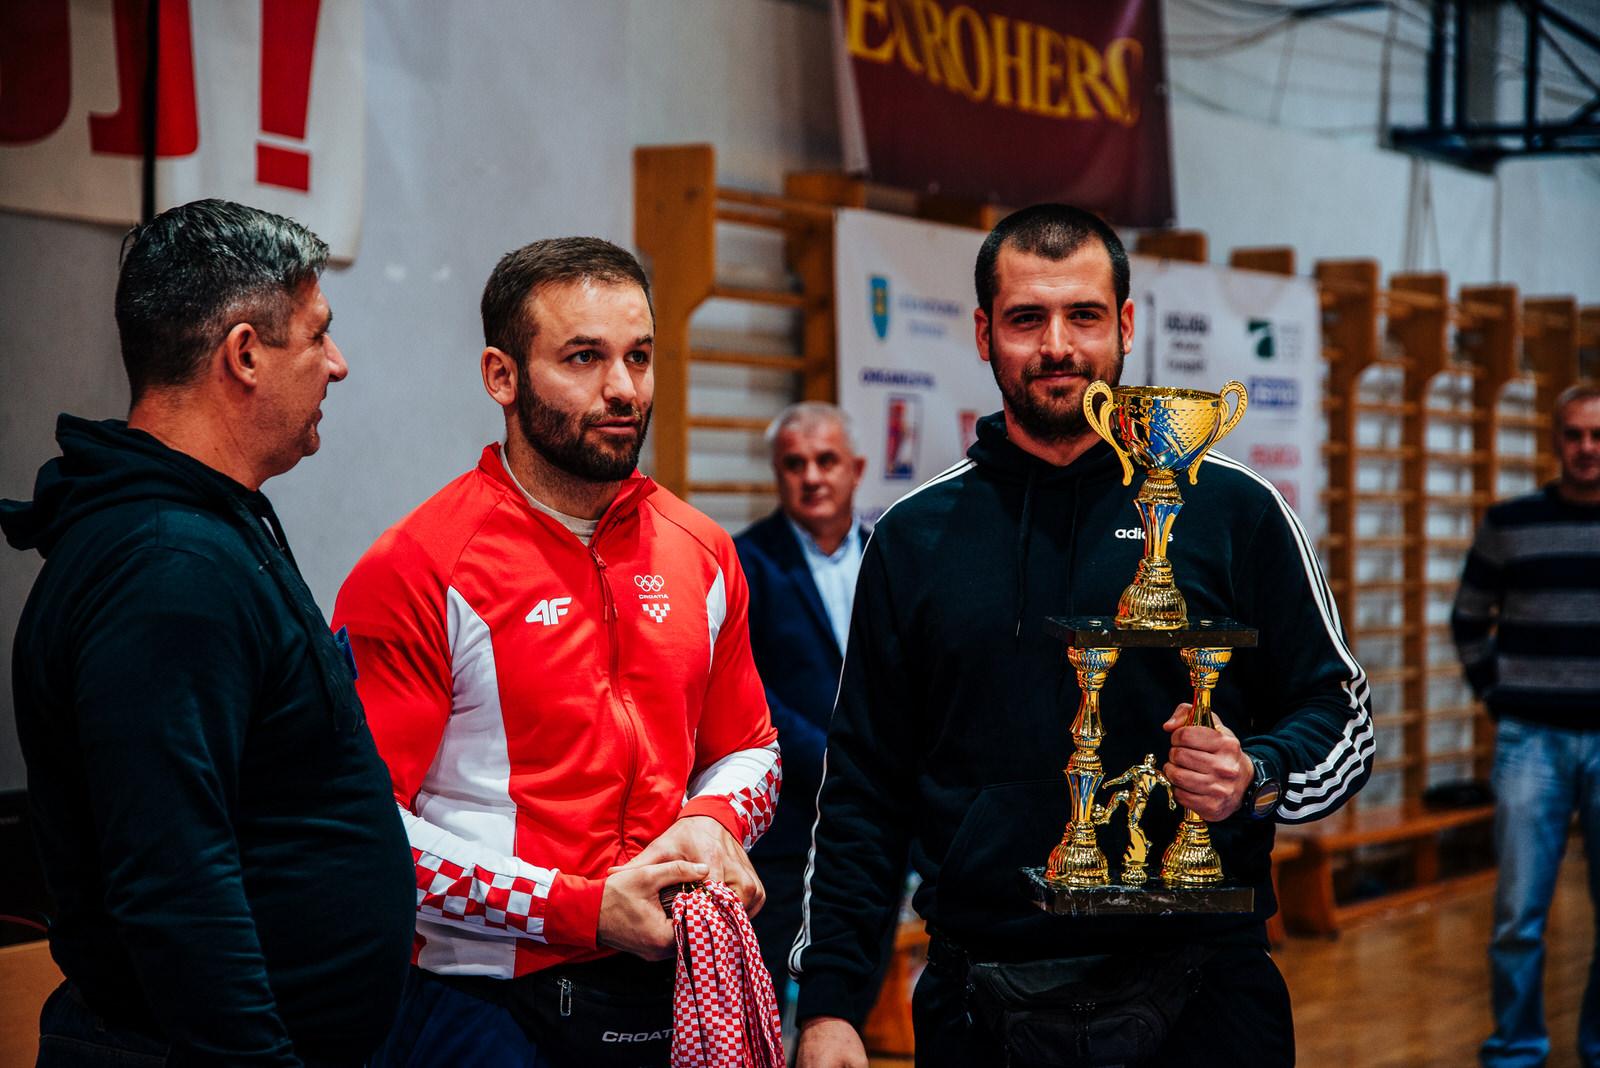 likaclub_zimska-malonogometna-liga-gospić_2019-20-134